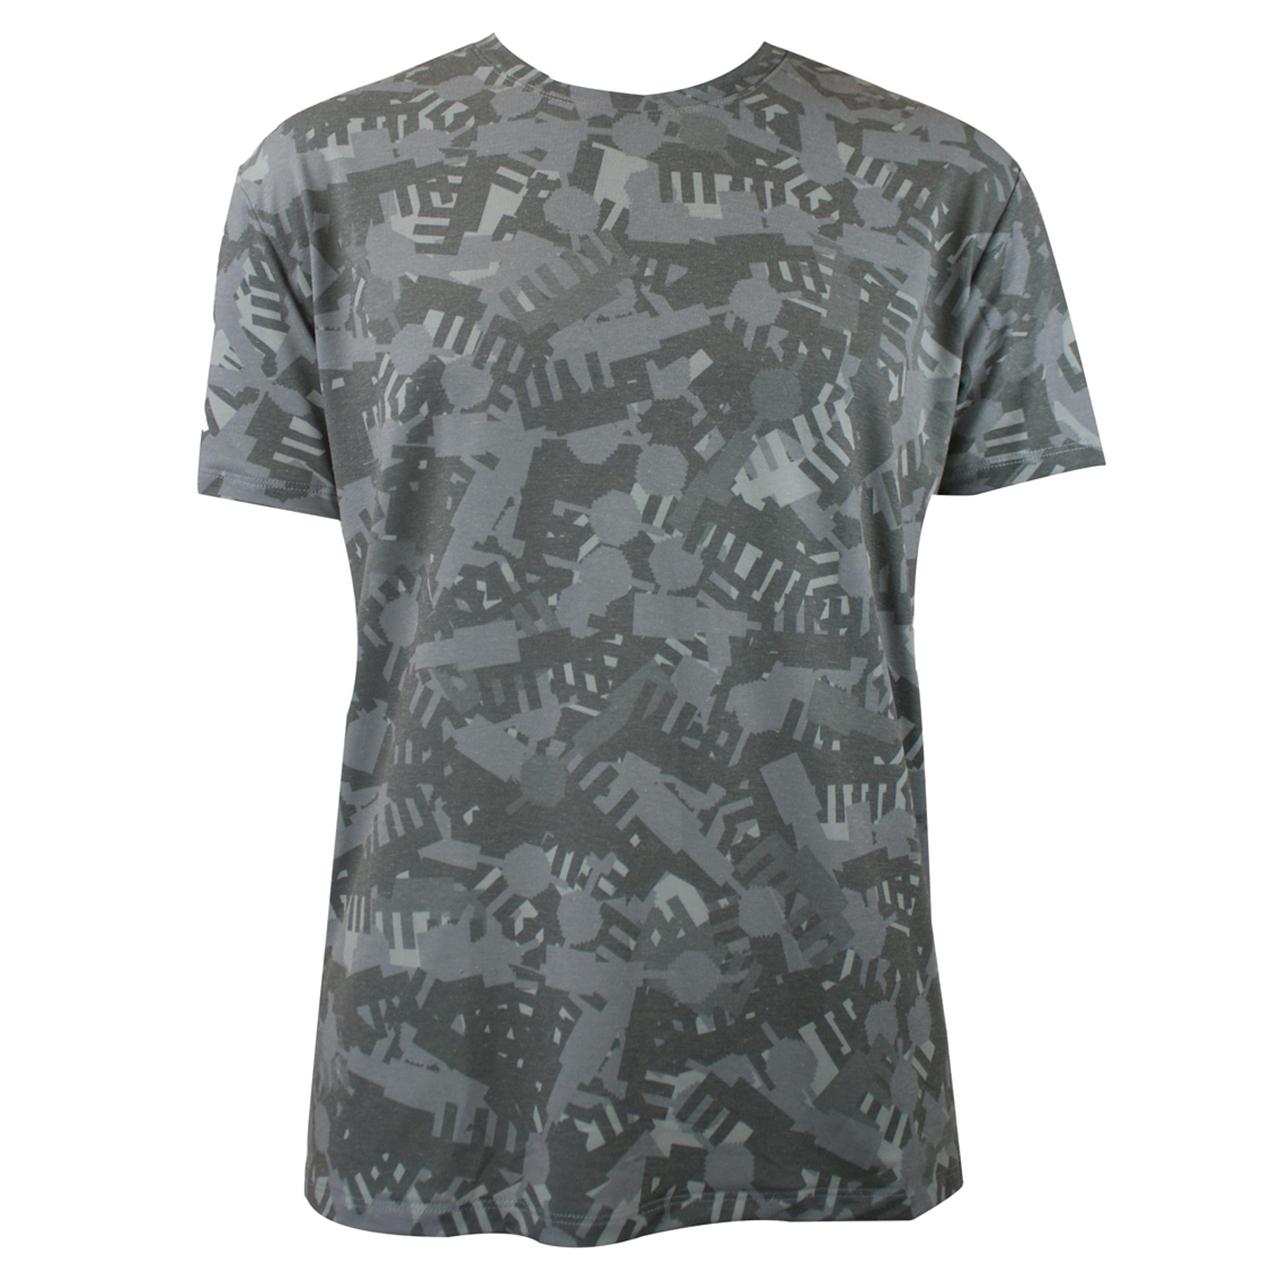 Berlin Design T-Shirt Alloverprint Camouflage kaki